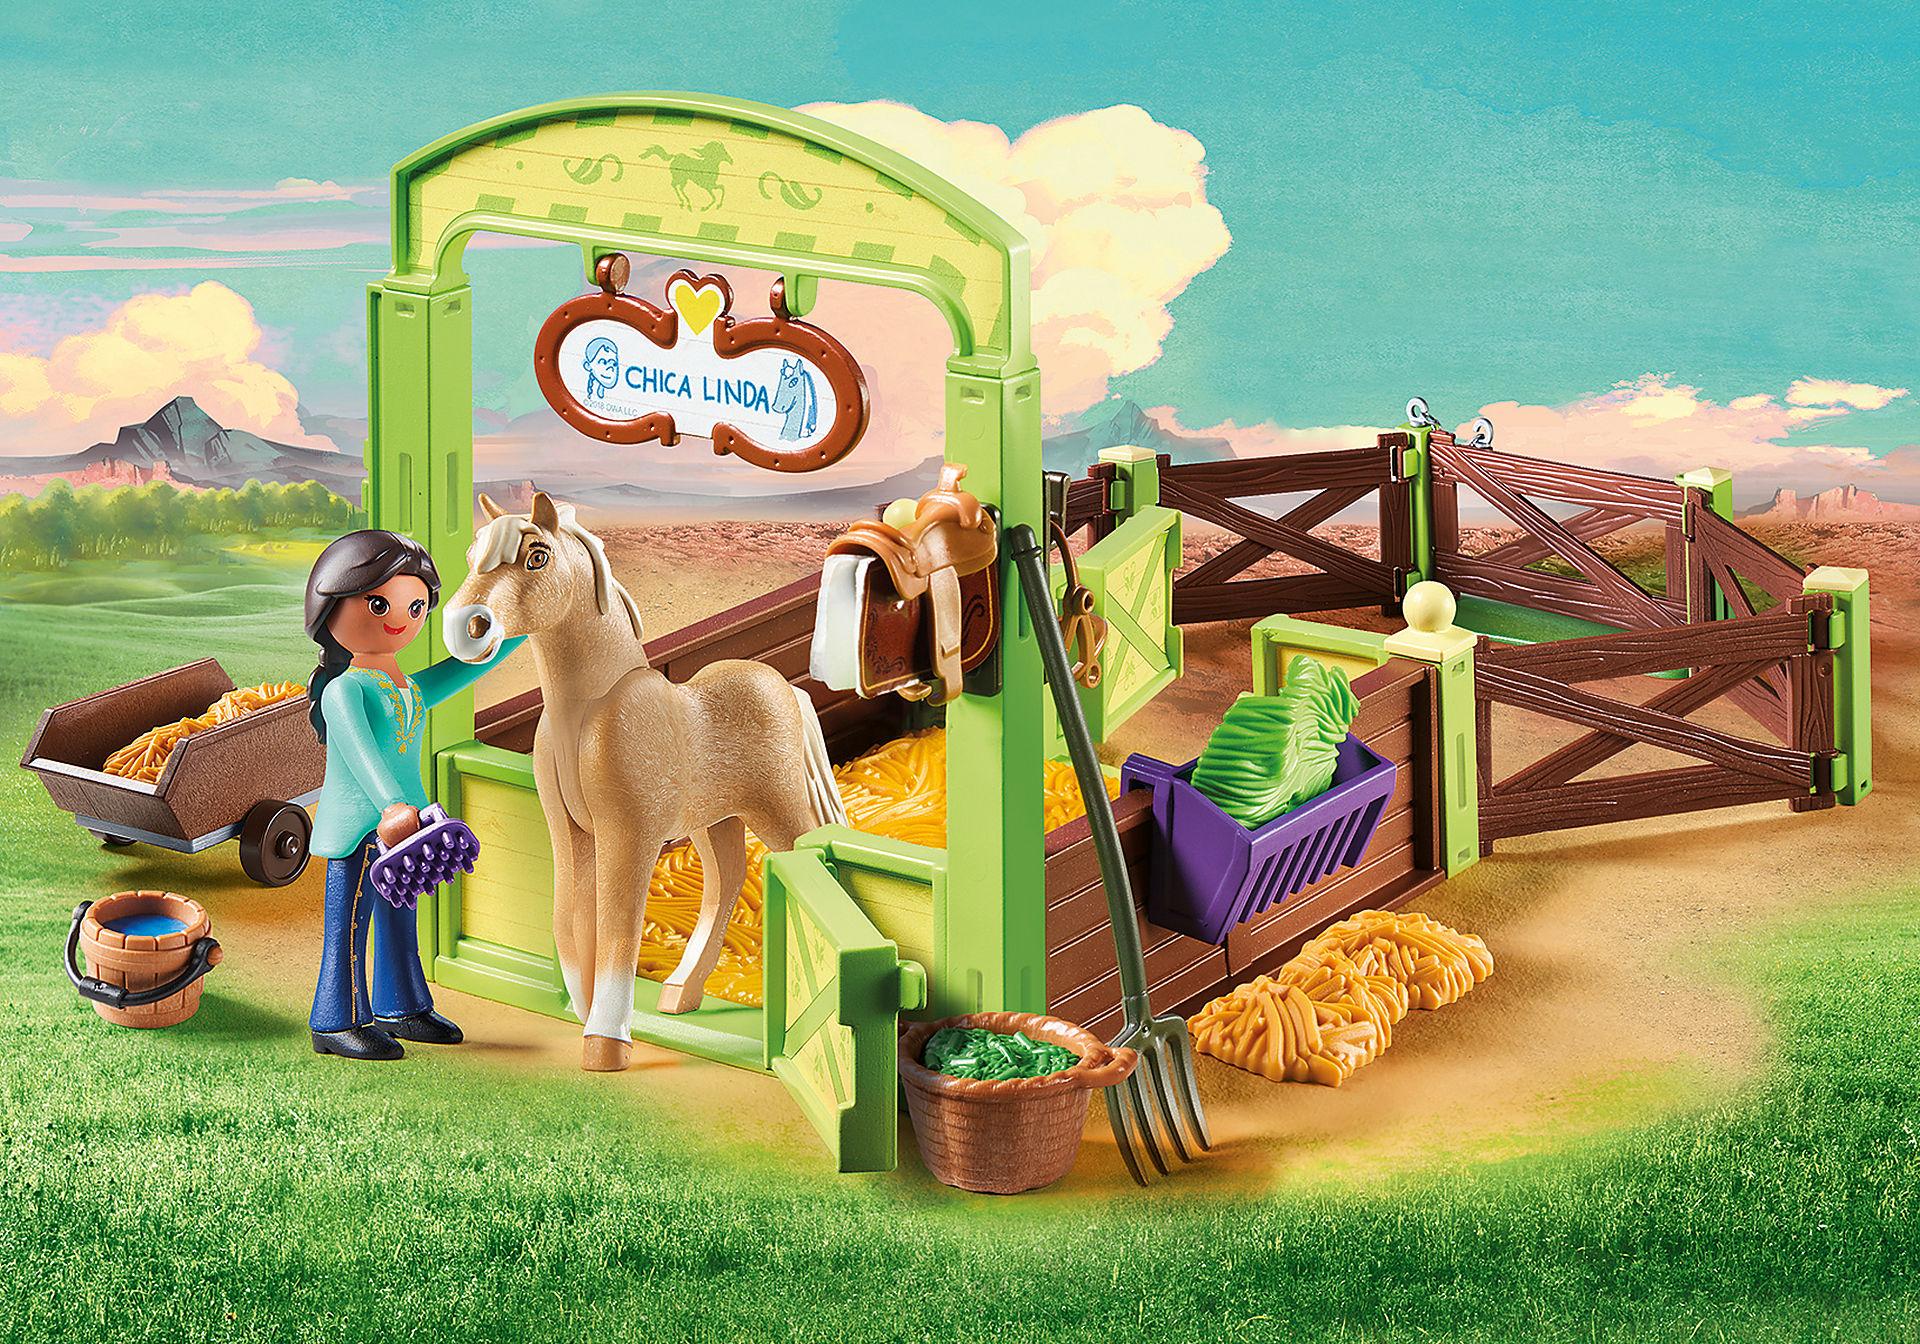 http://media.playmobil.com/i/playmobil/9479_product_detail/Η Πρου με το άλογο Τσίκα Λίντα